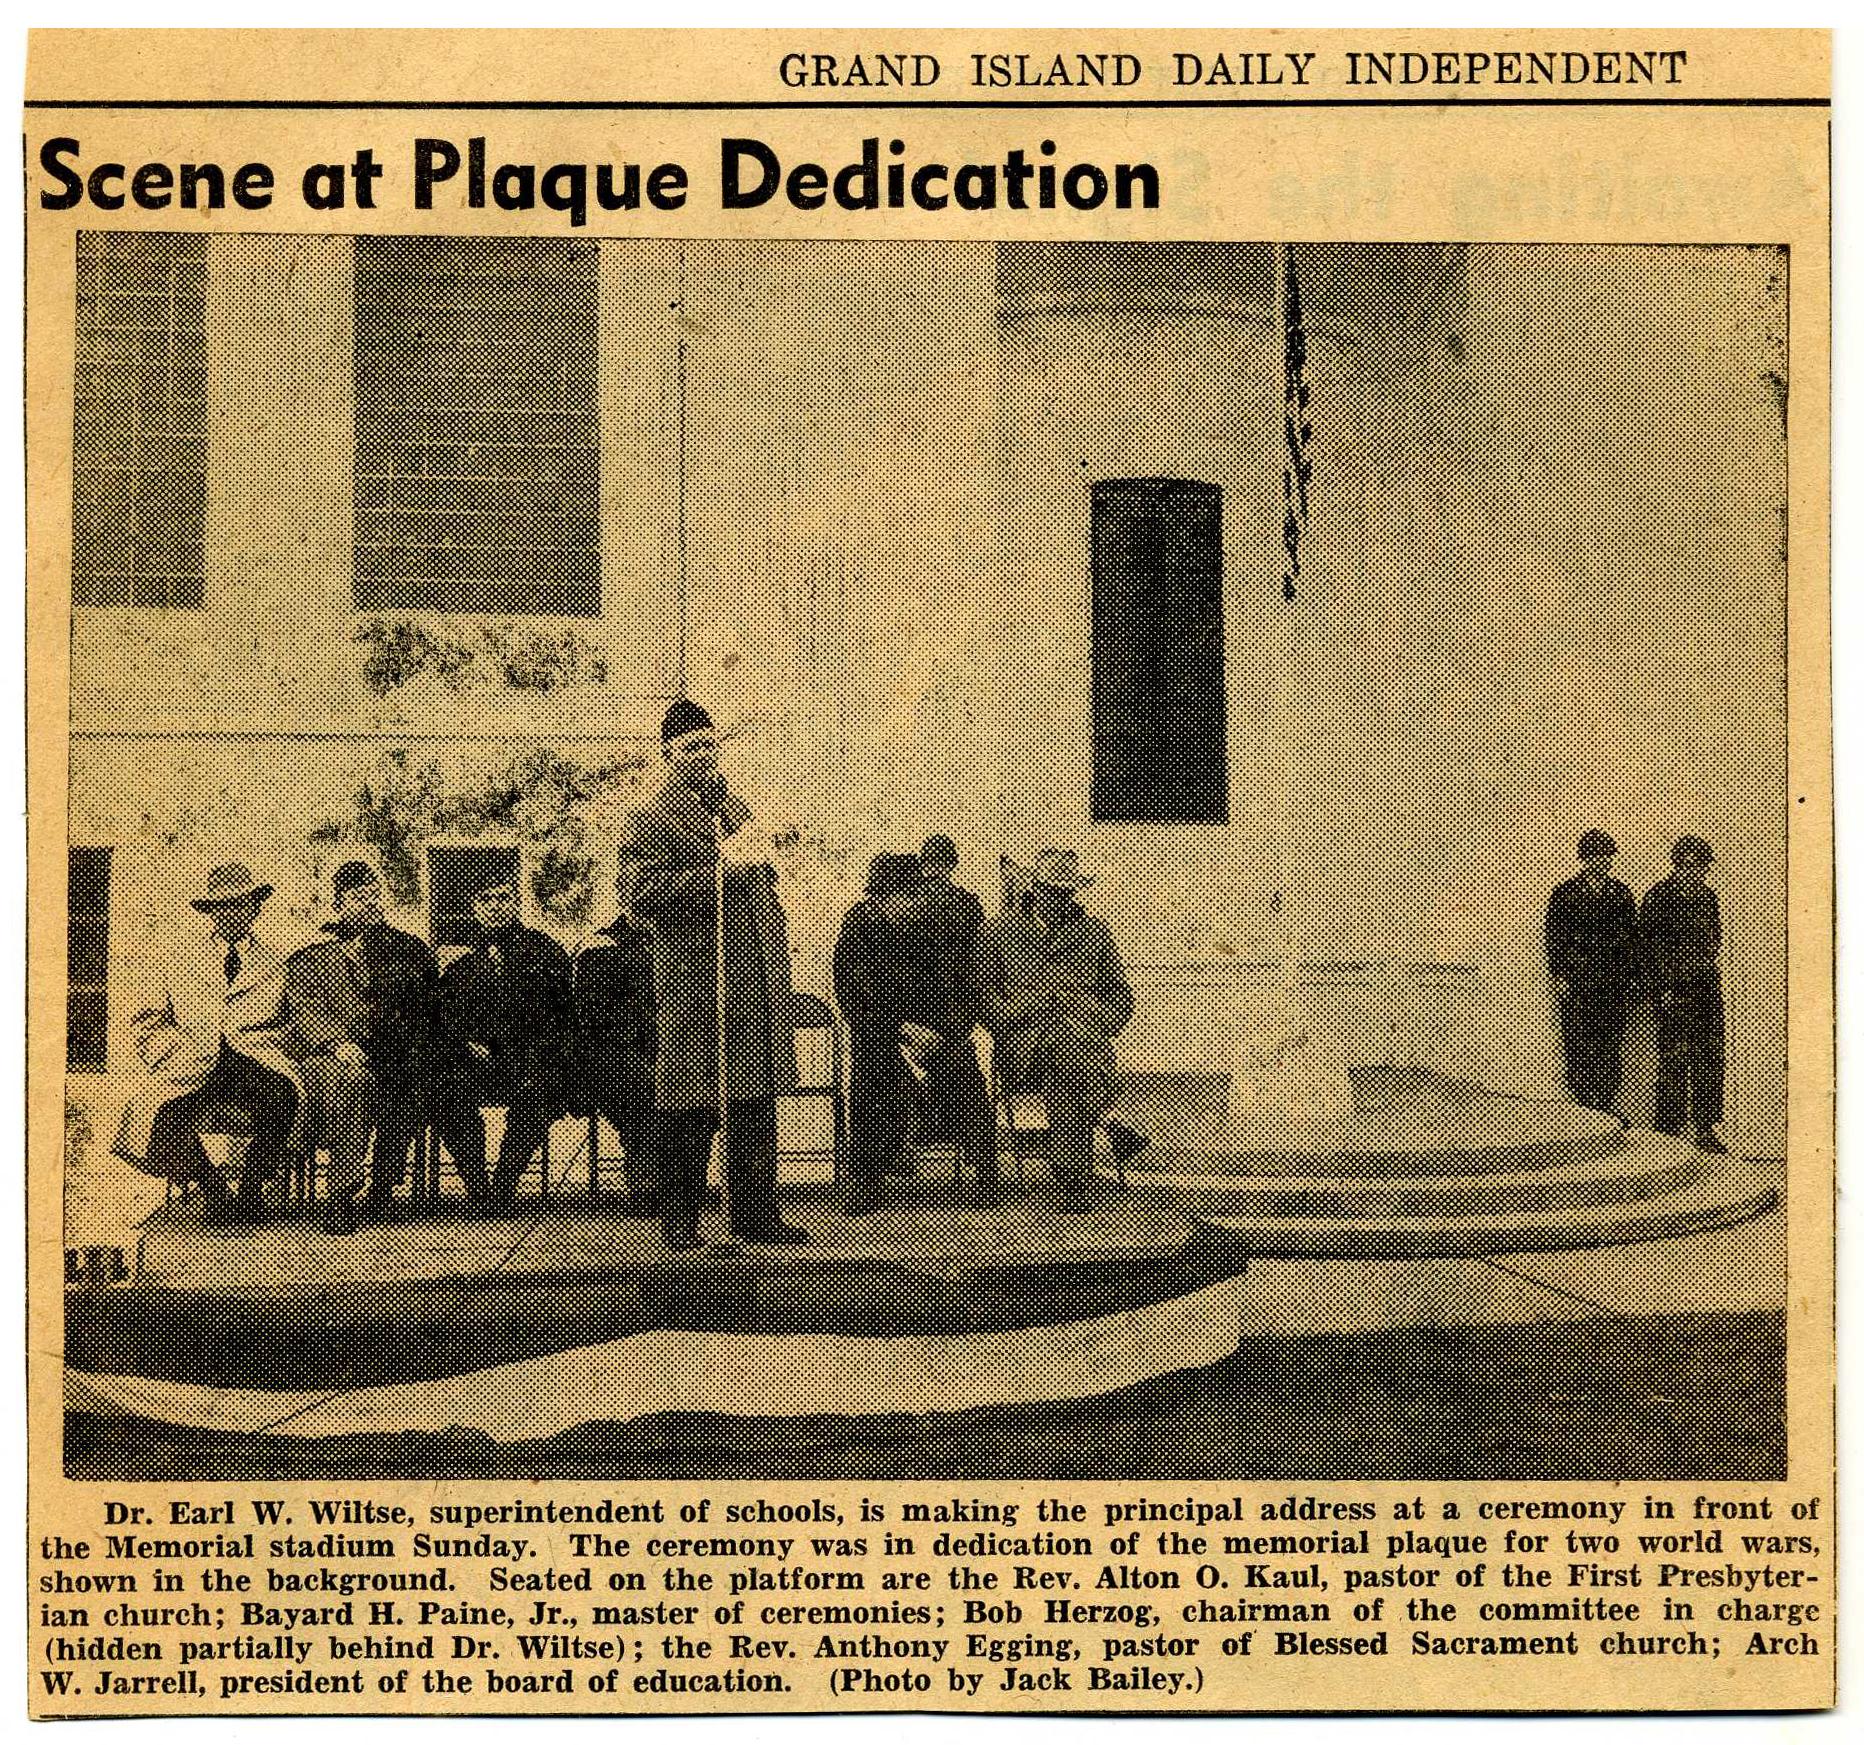 November 1950: Memorial Plaque is Unveiled